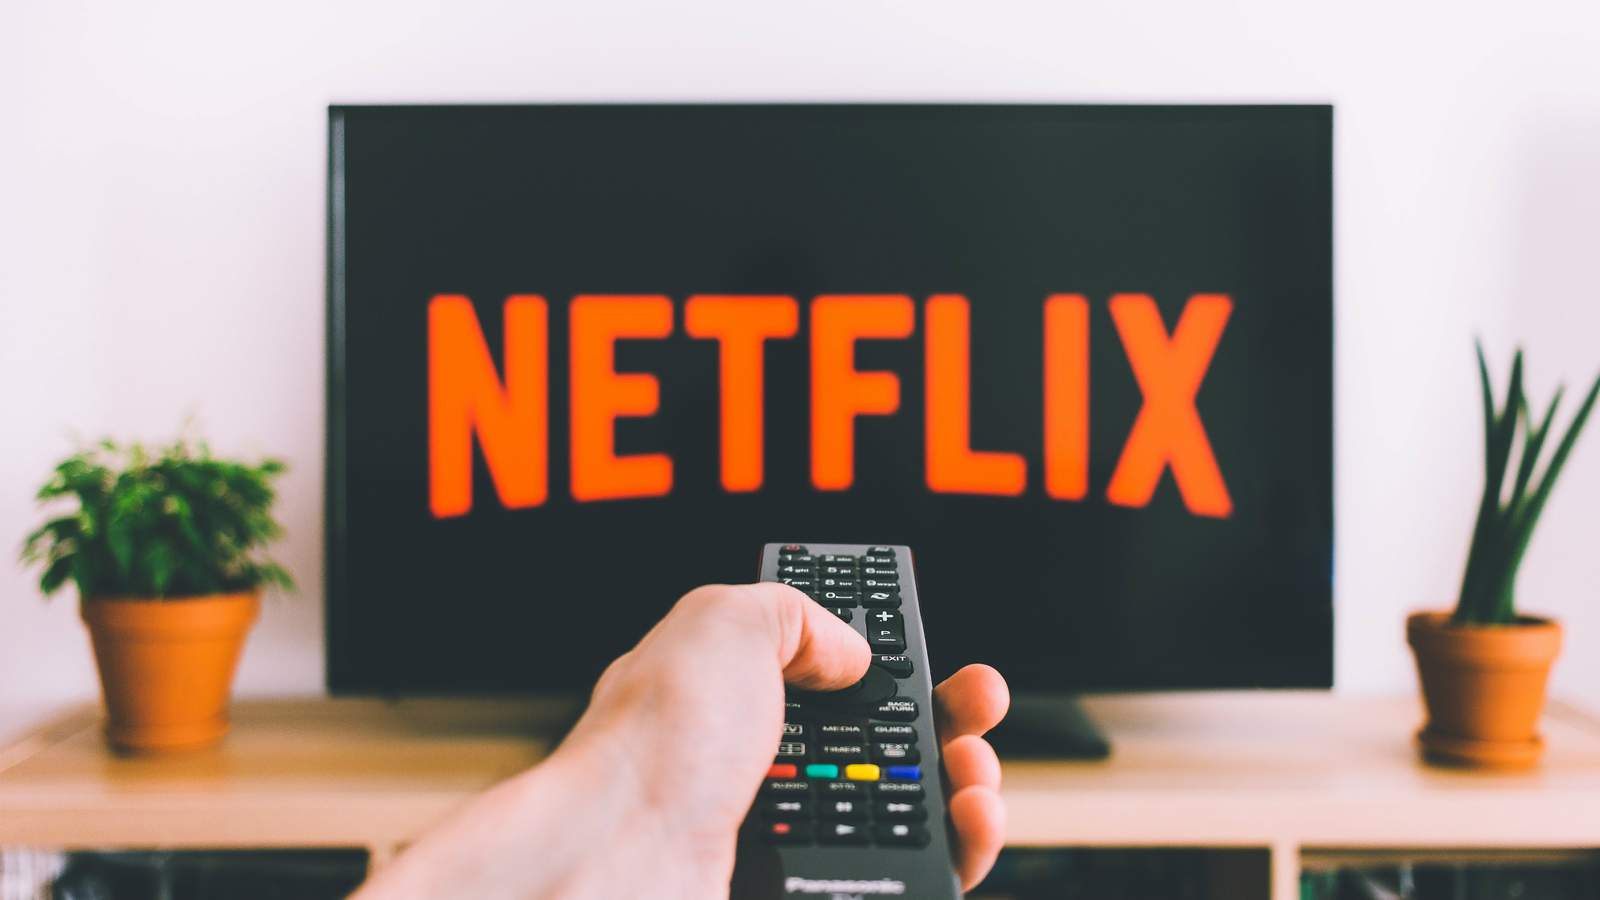 Netflix - روز جمعه سهام Netflix با افزایش 1.7 درصدی روبرو شد!